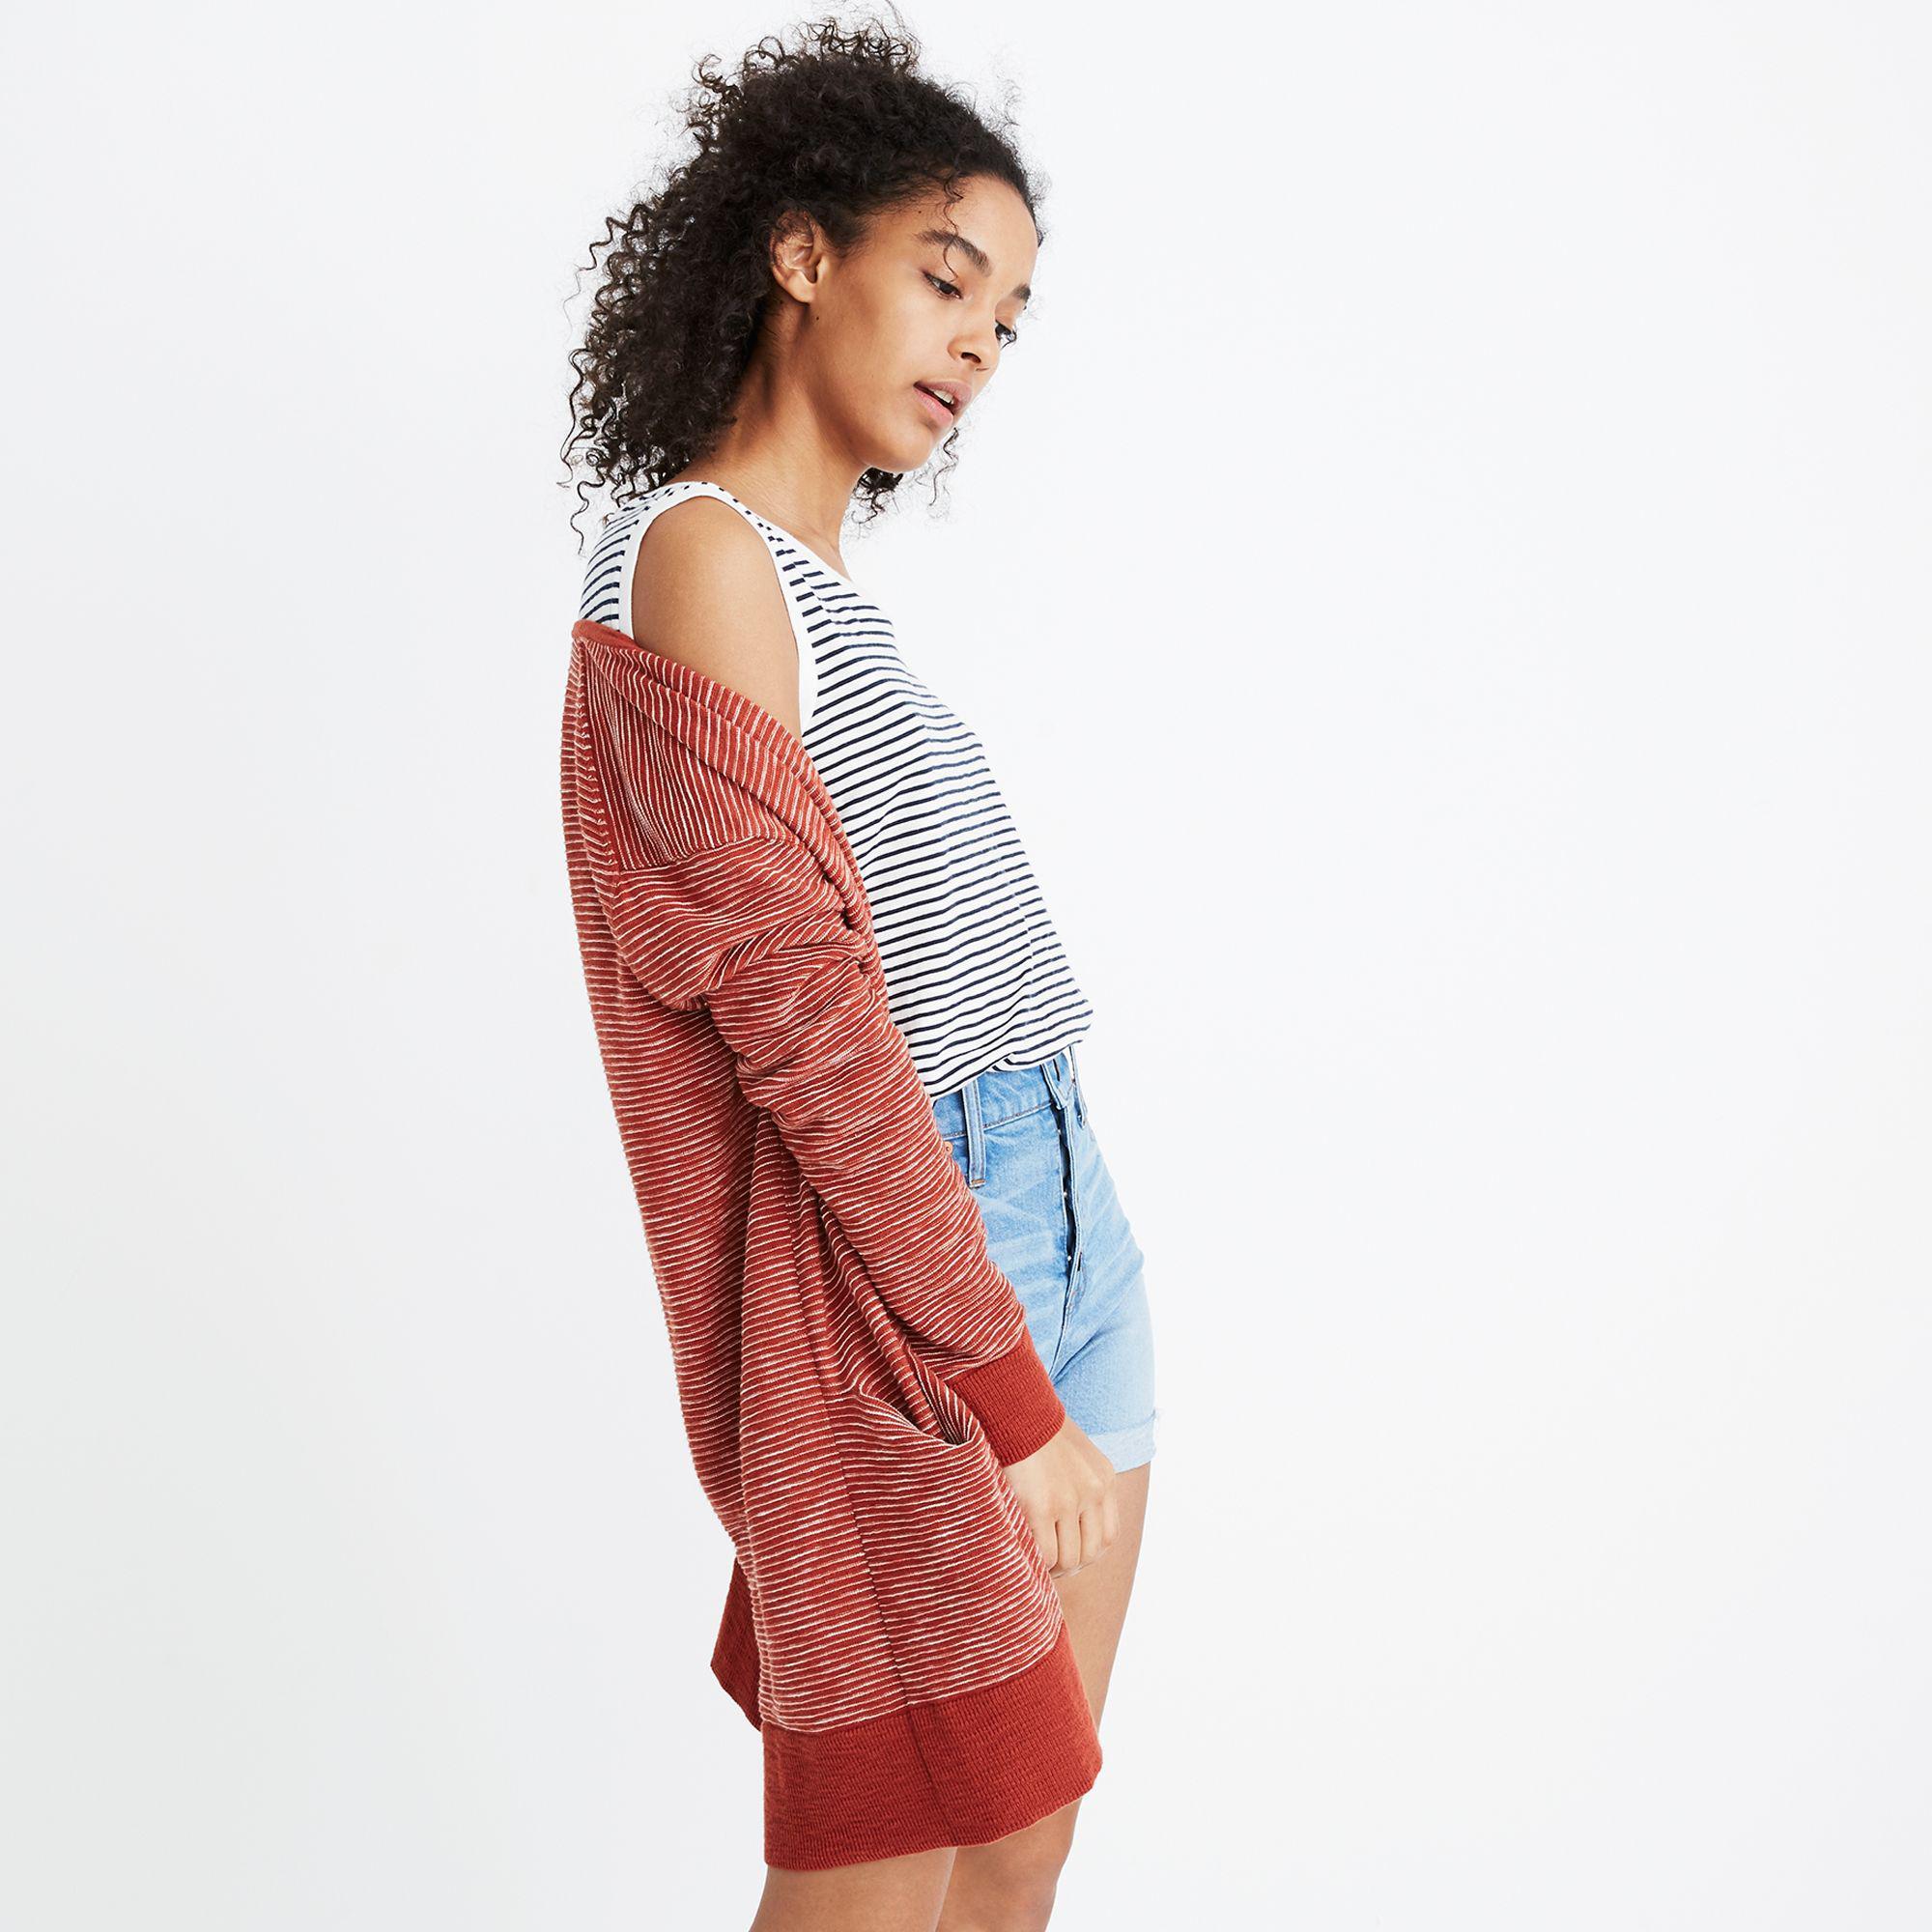 6e005ddfb3 Madewell Summer Ryder Cardigan Sweater - Lyst